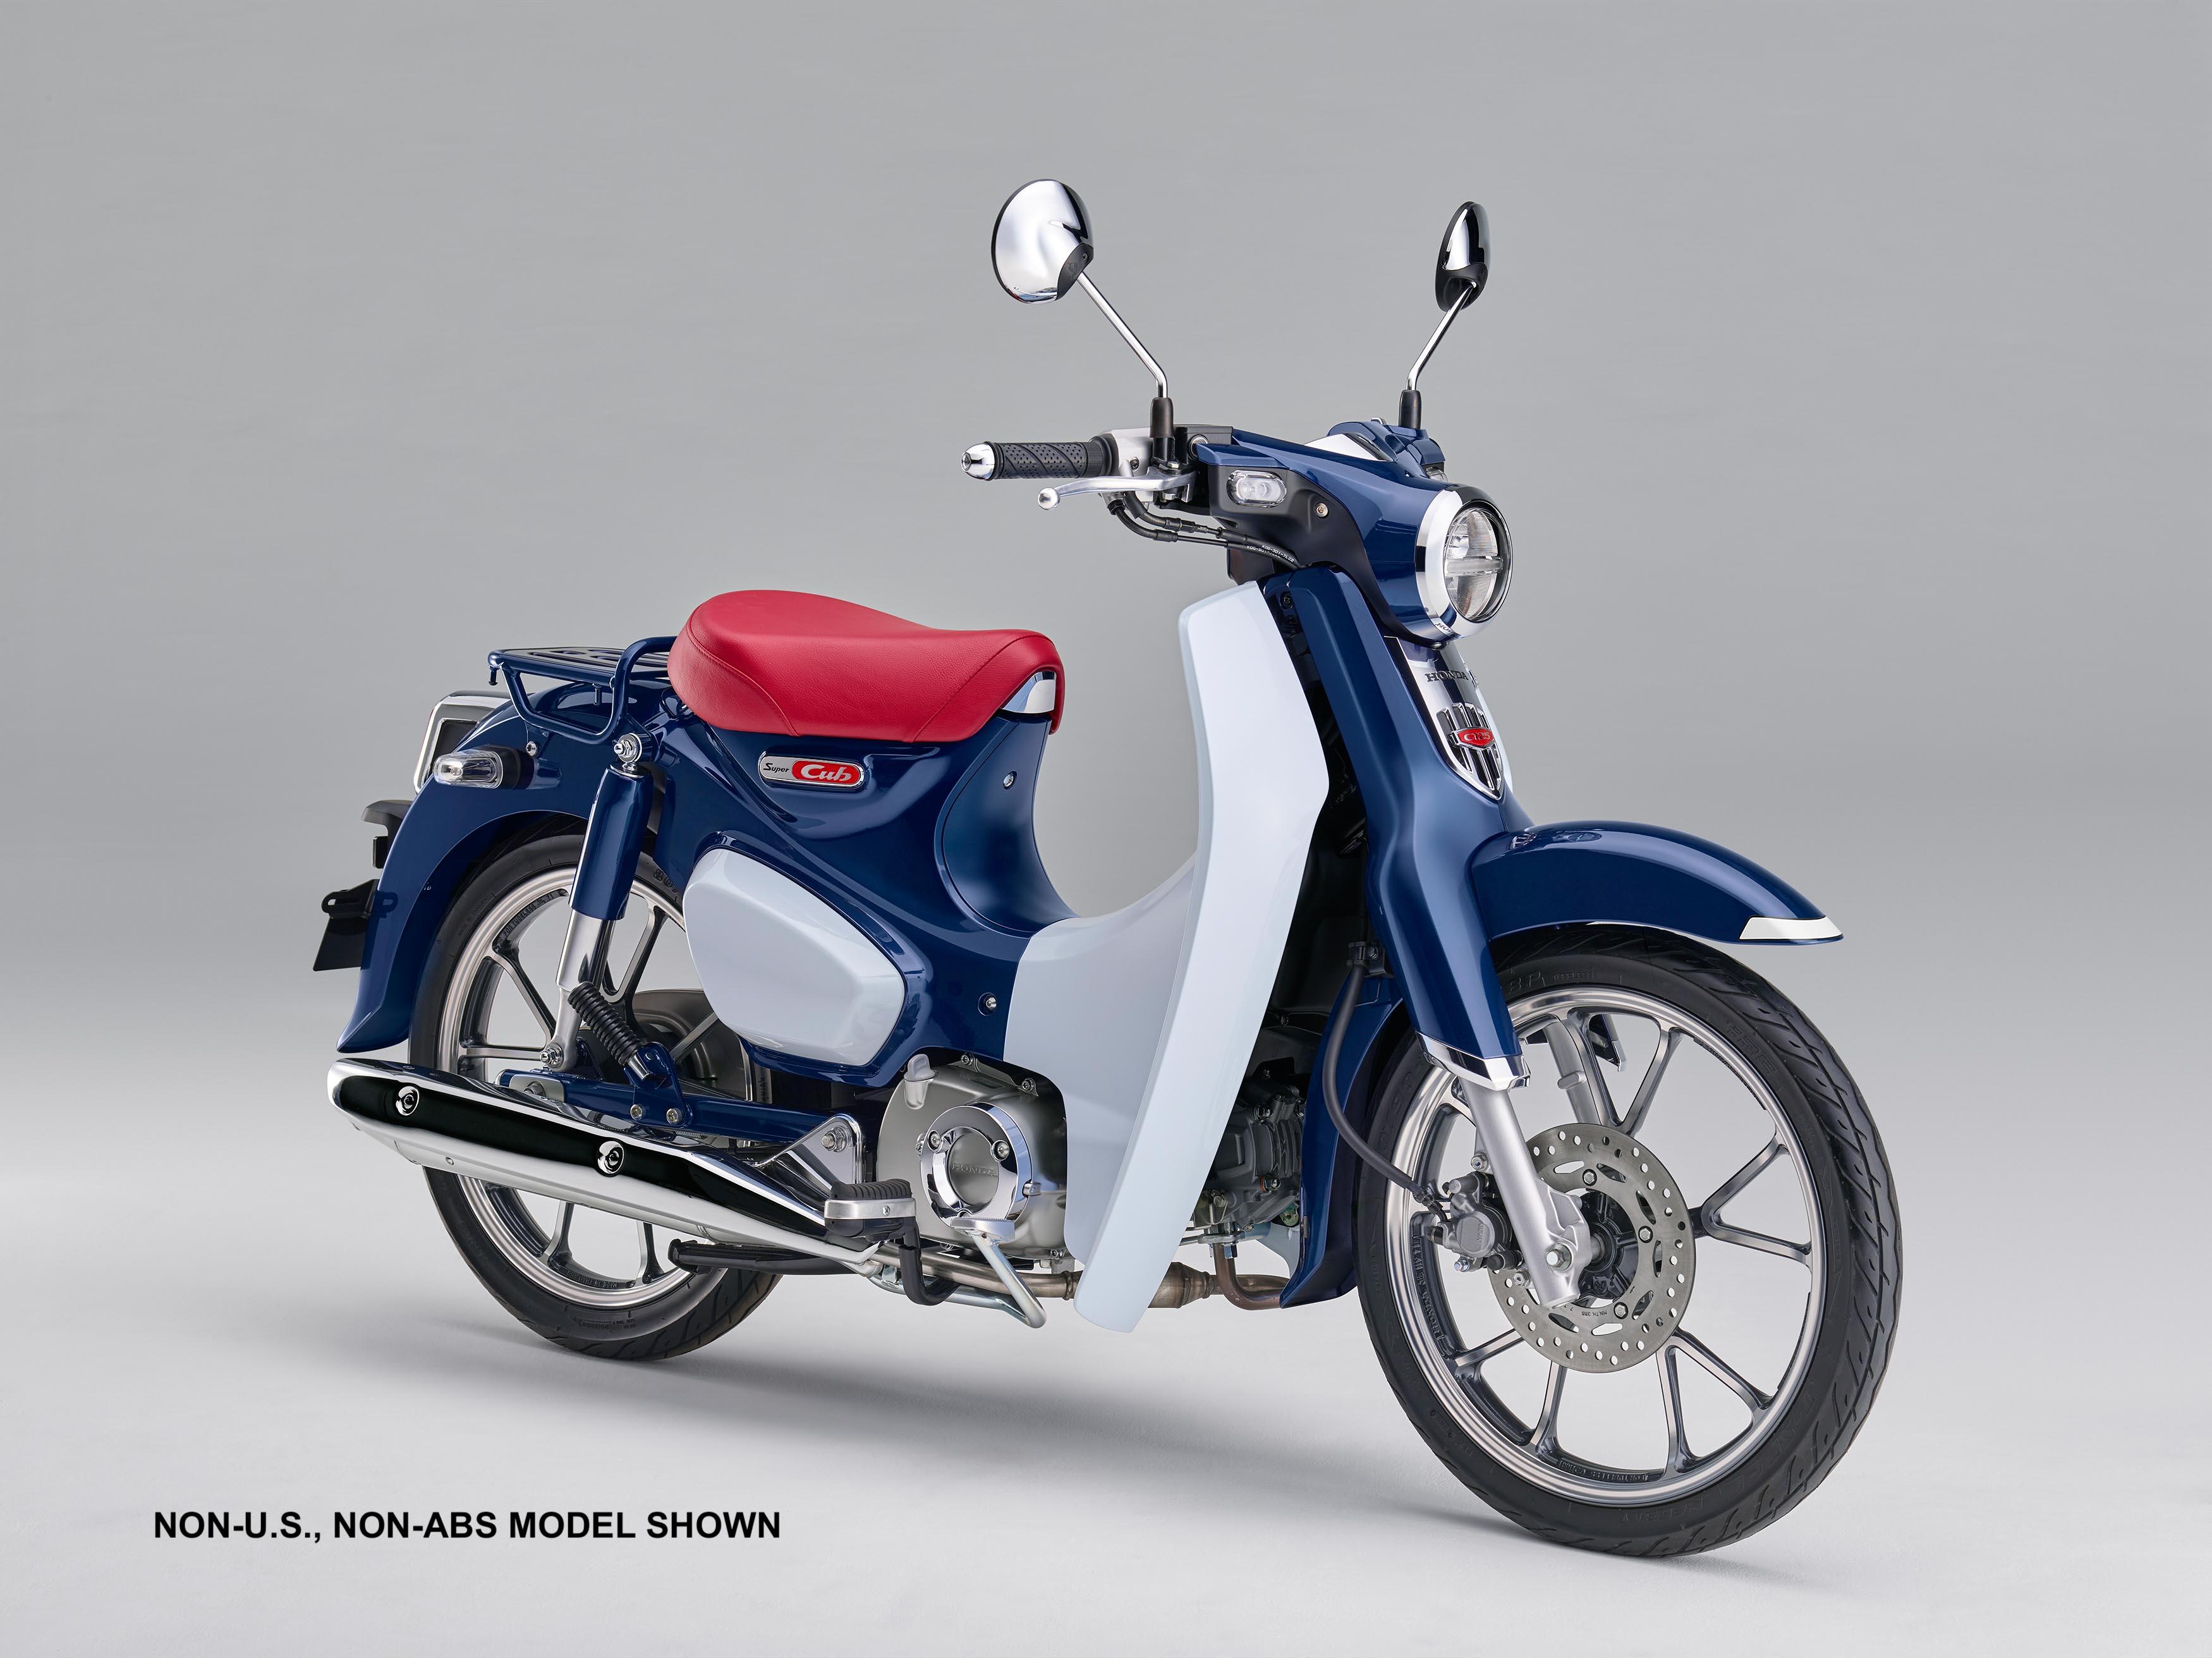 2019 Honda Super Cub side view